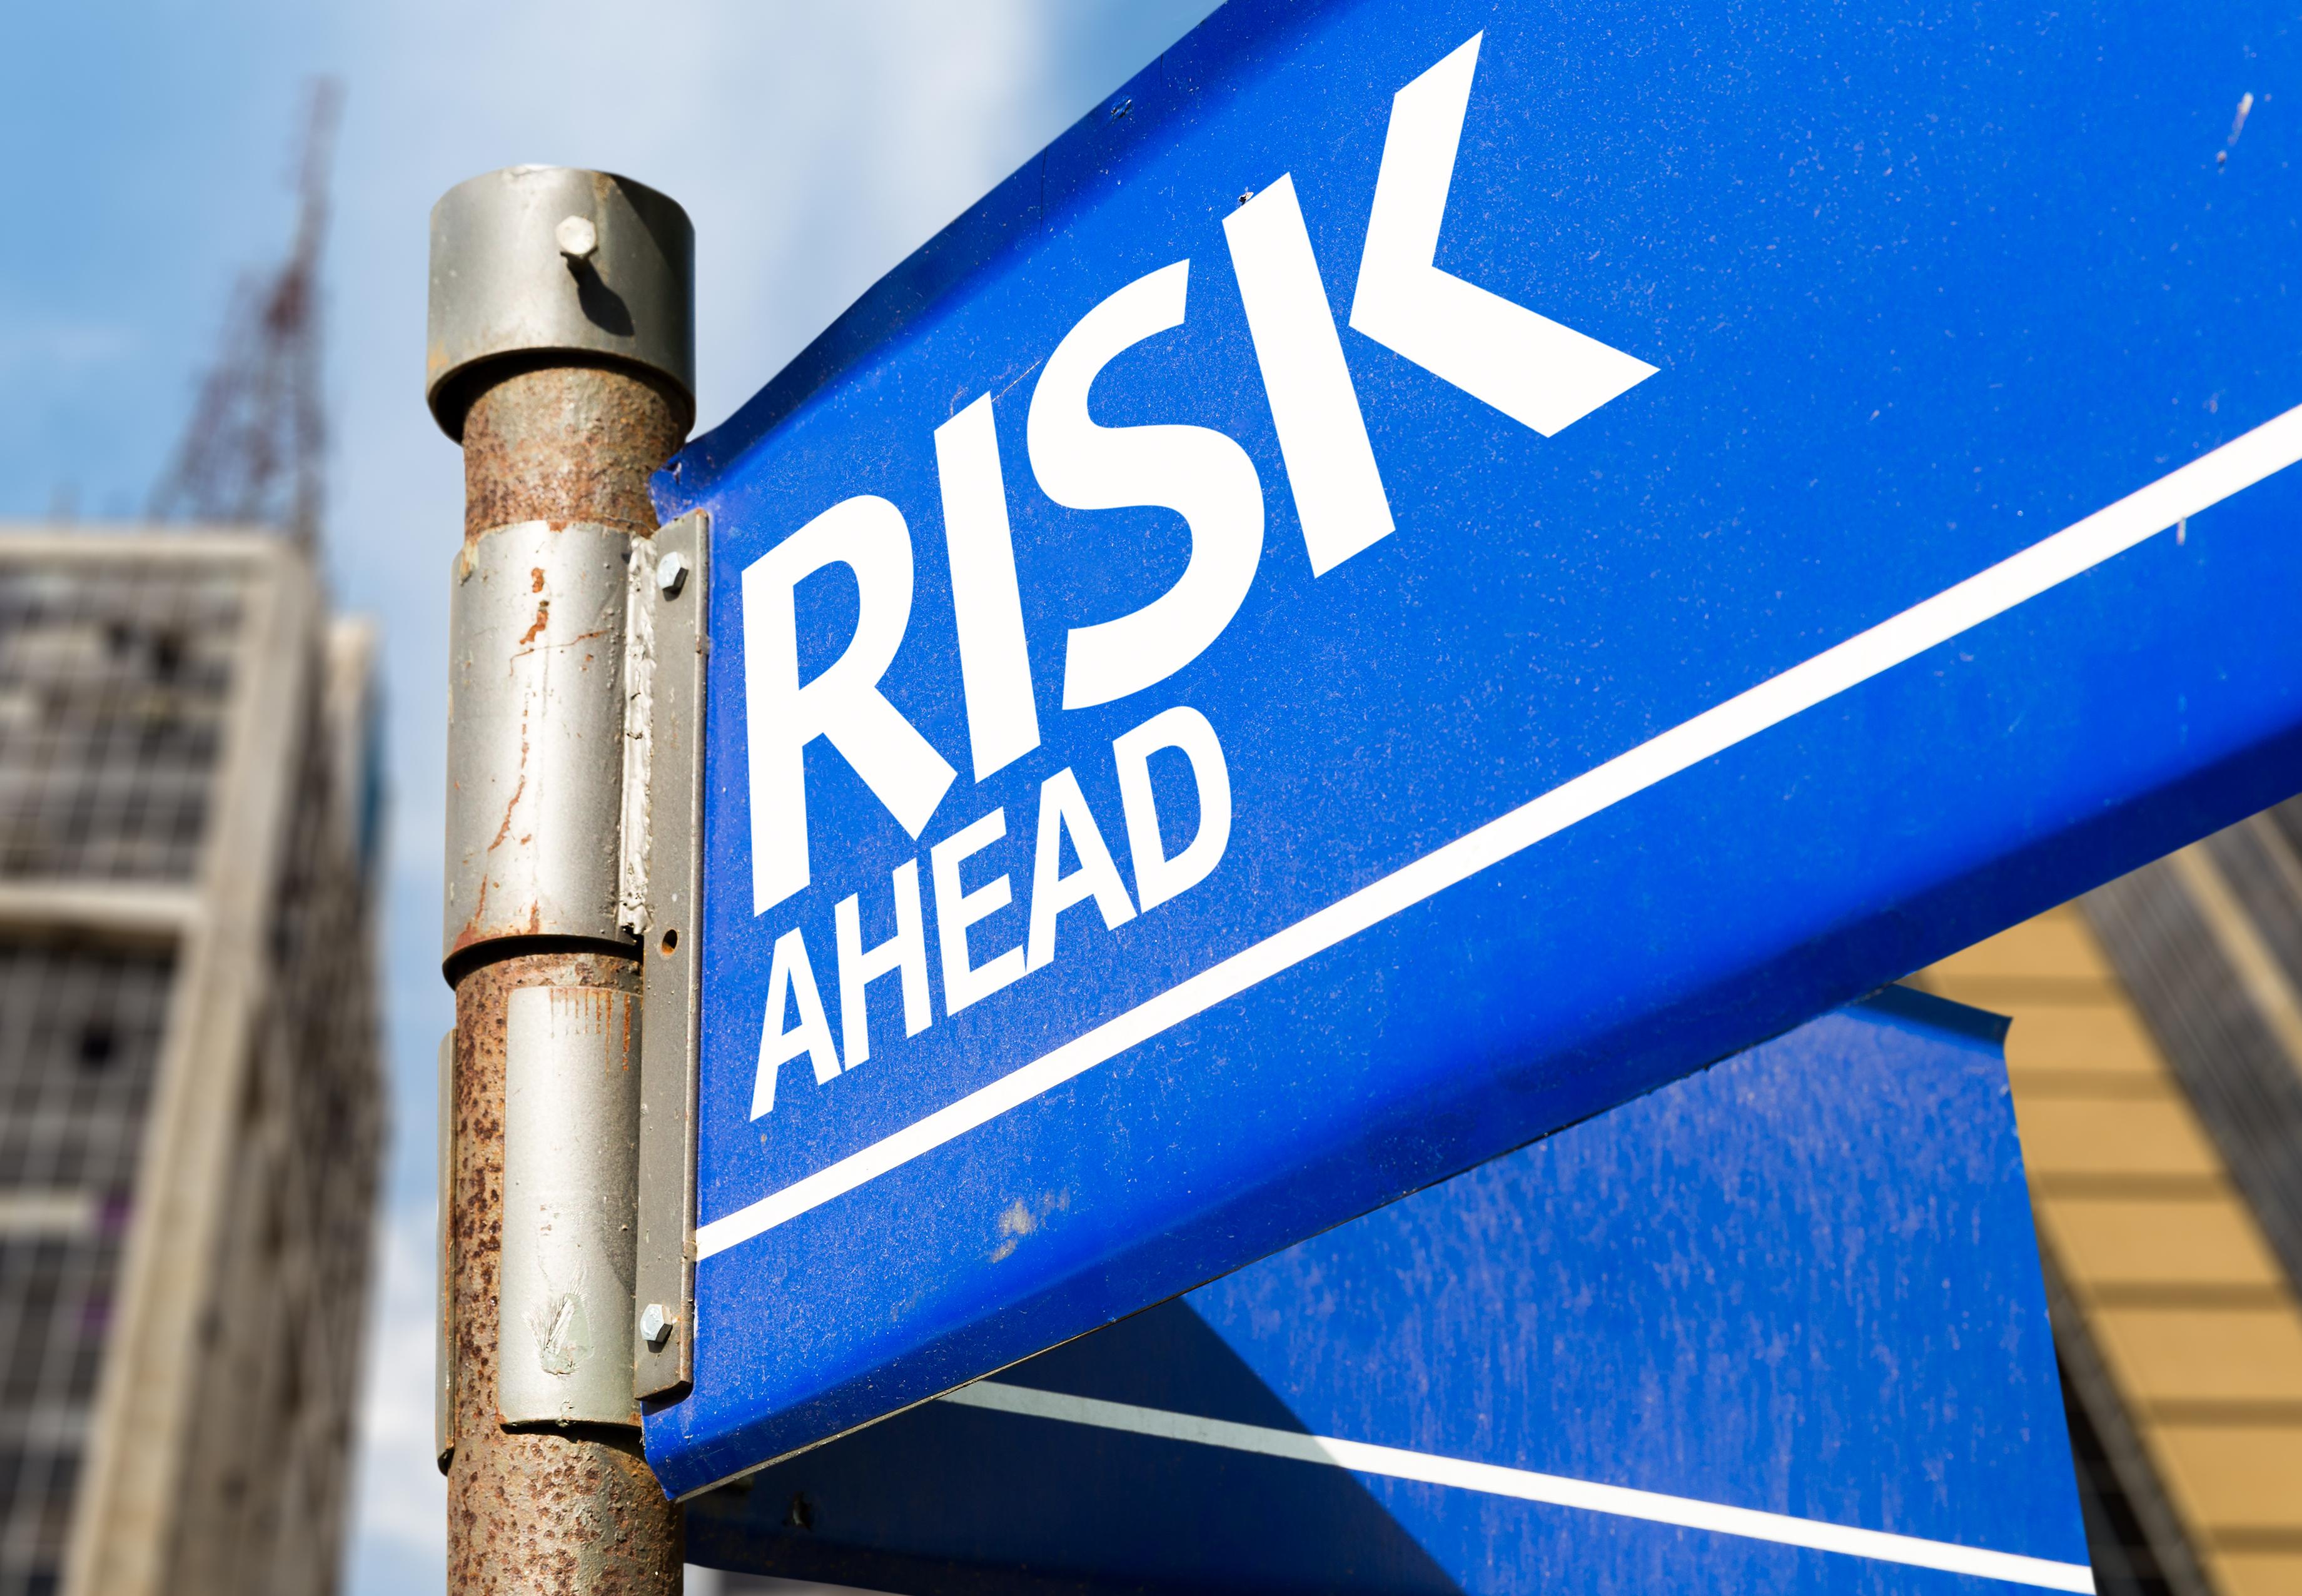 Risk ahead street sign